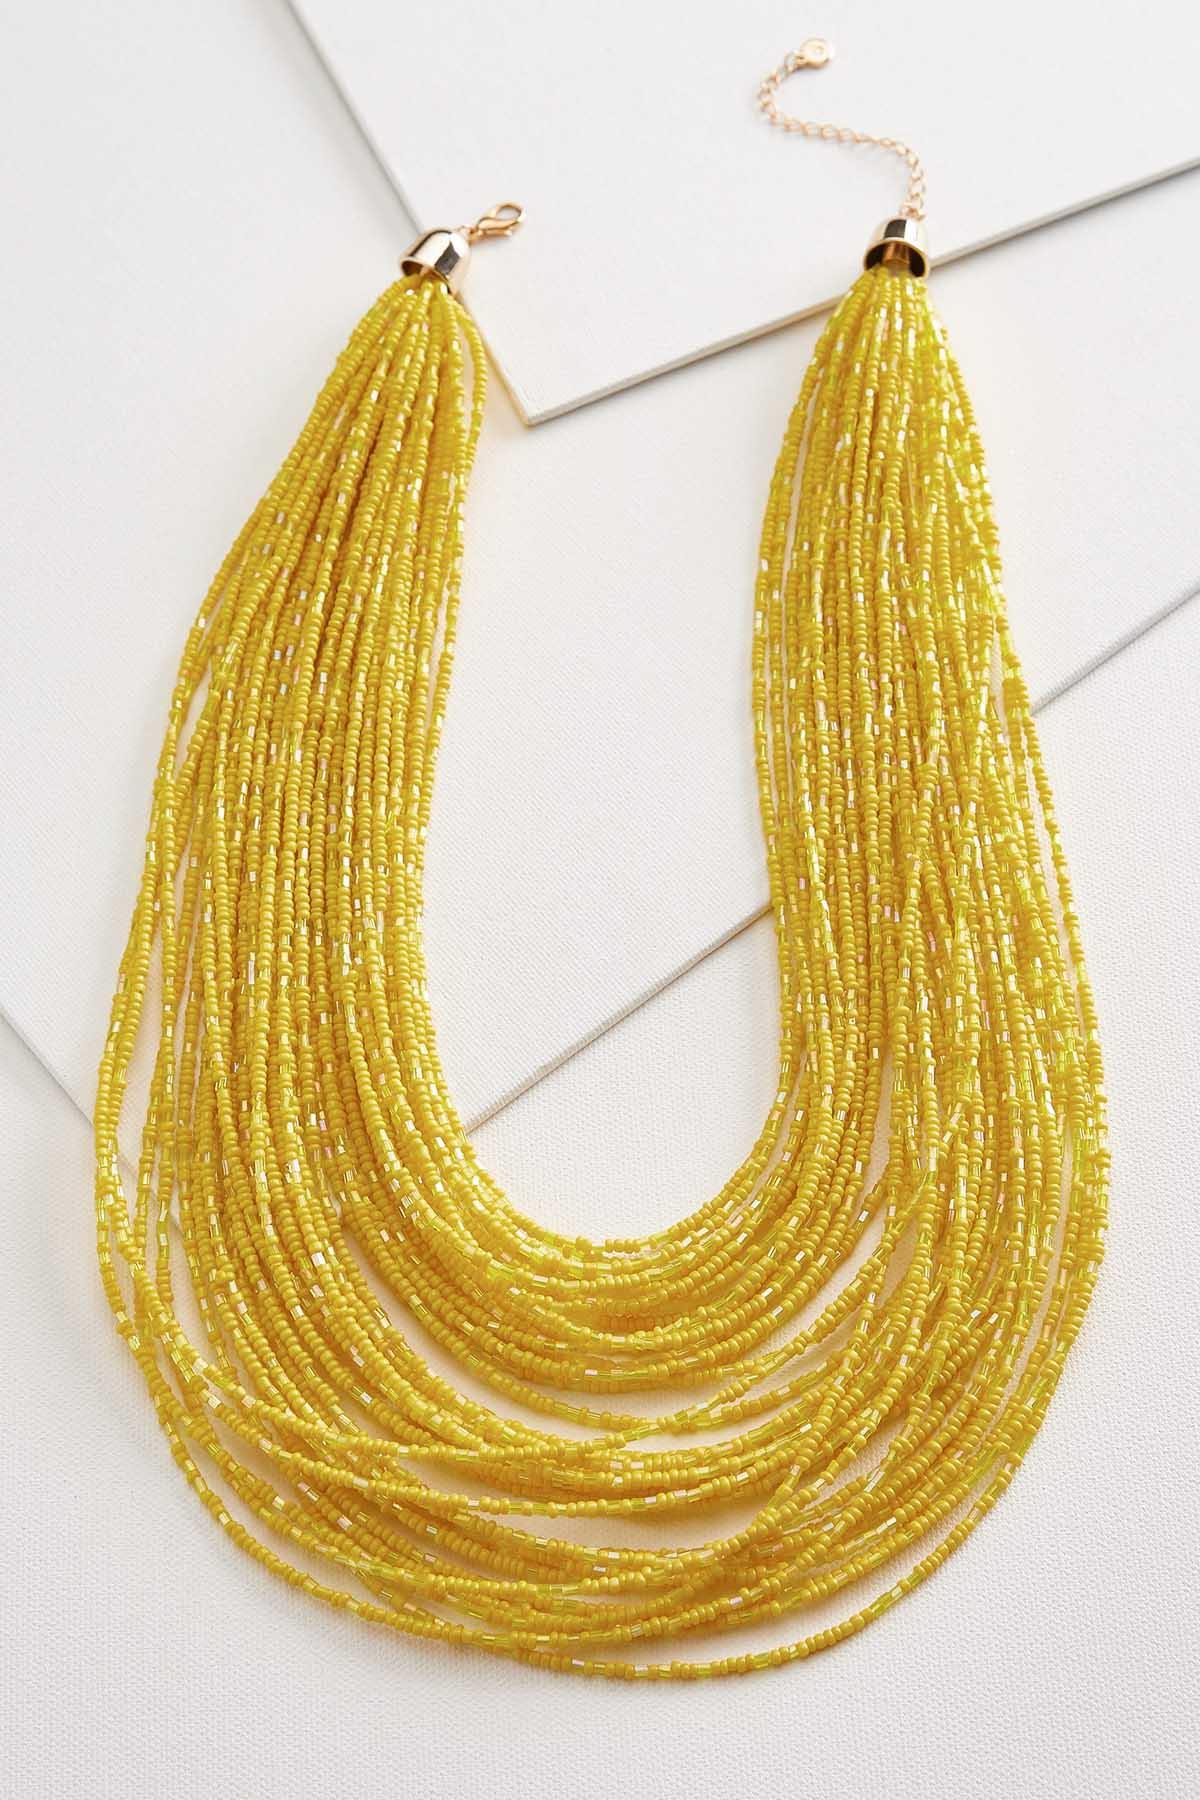 HABANERO_GOLD